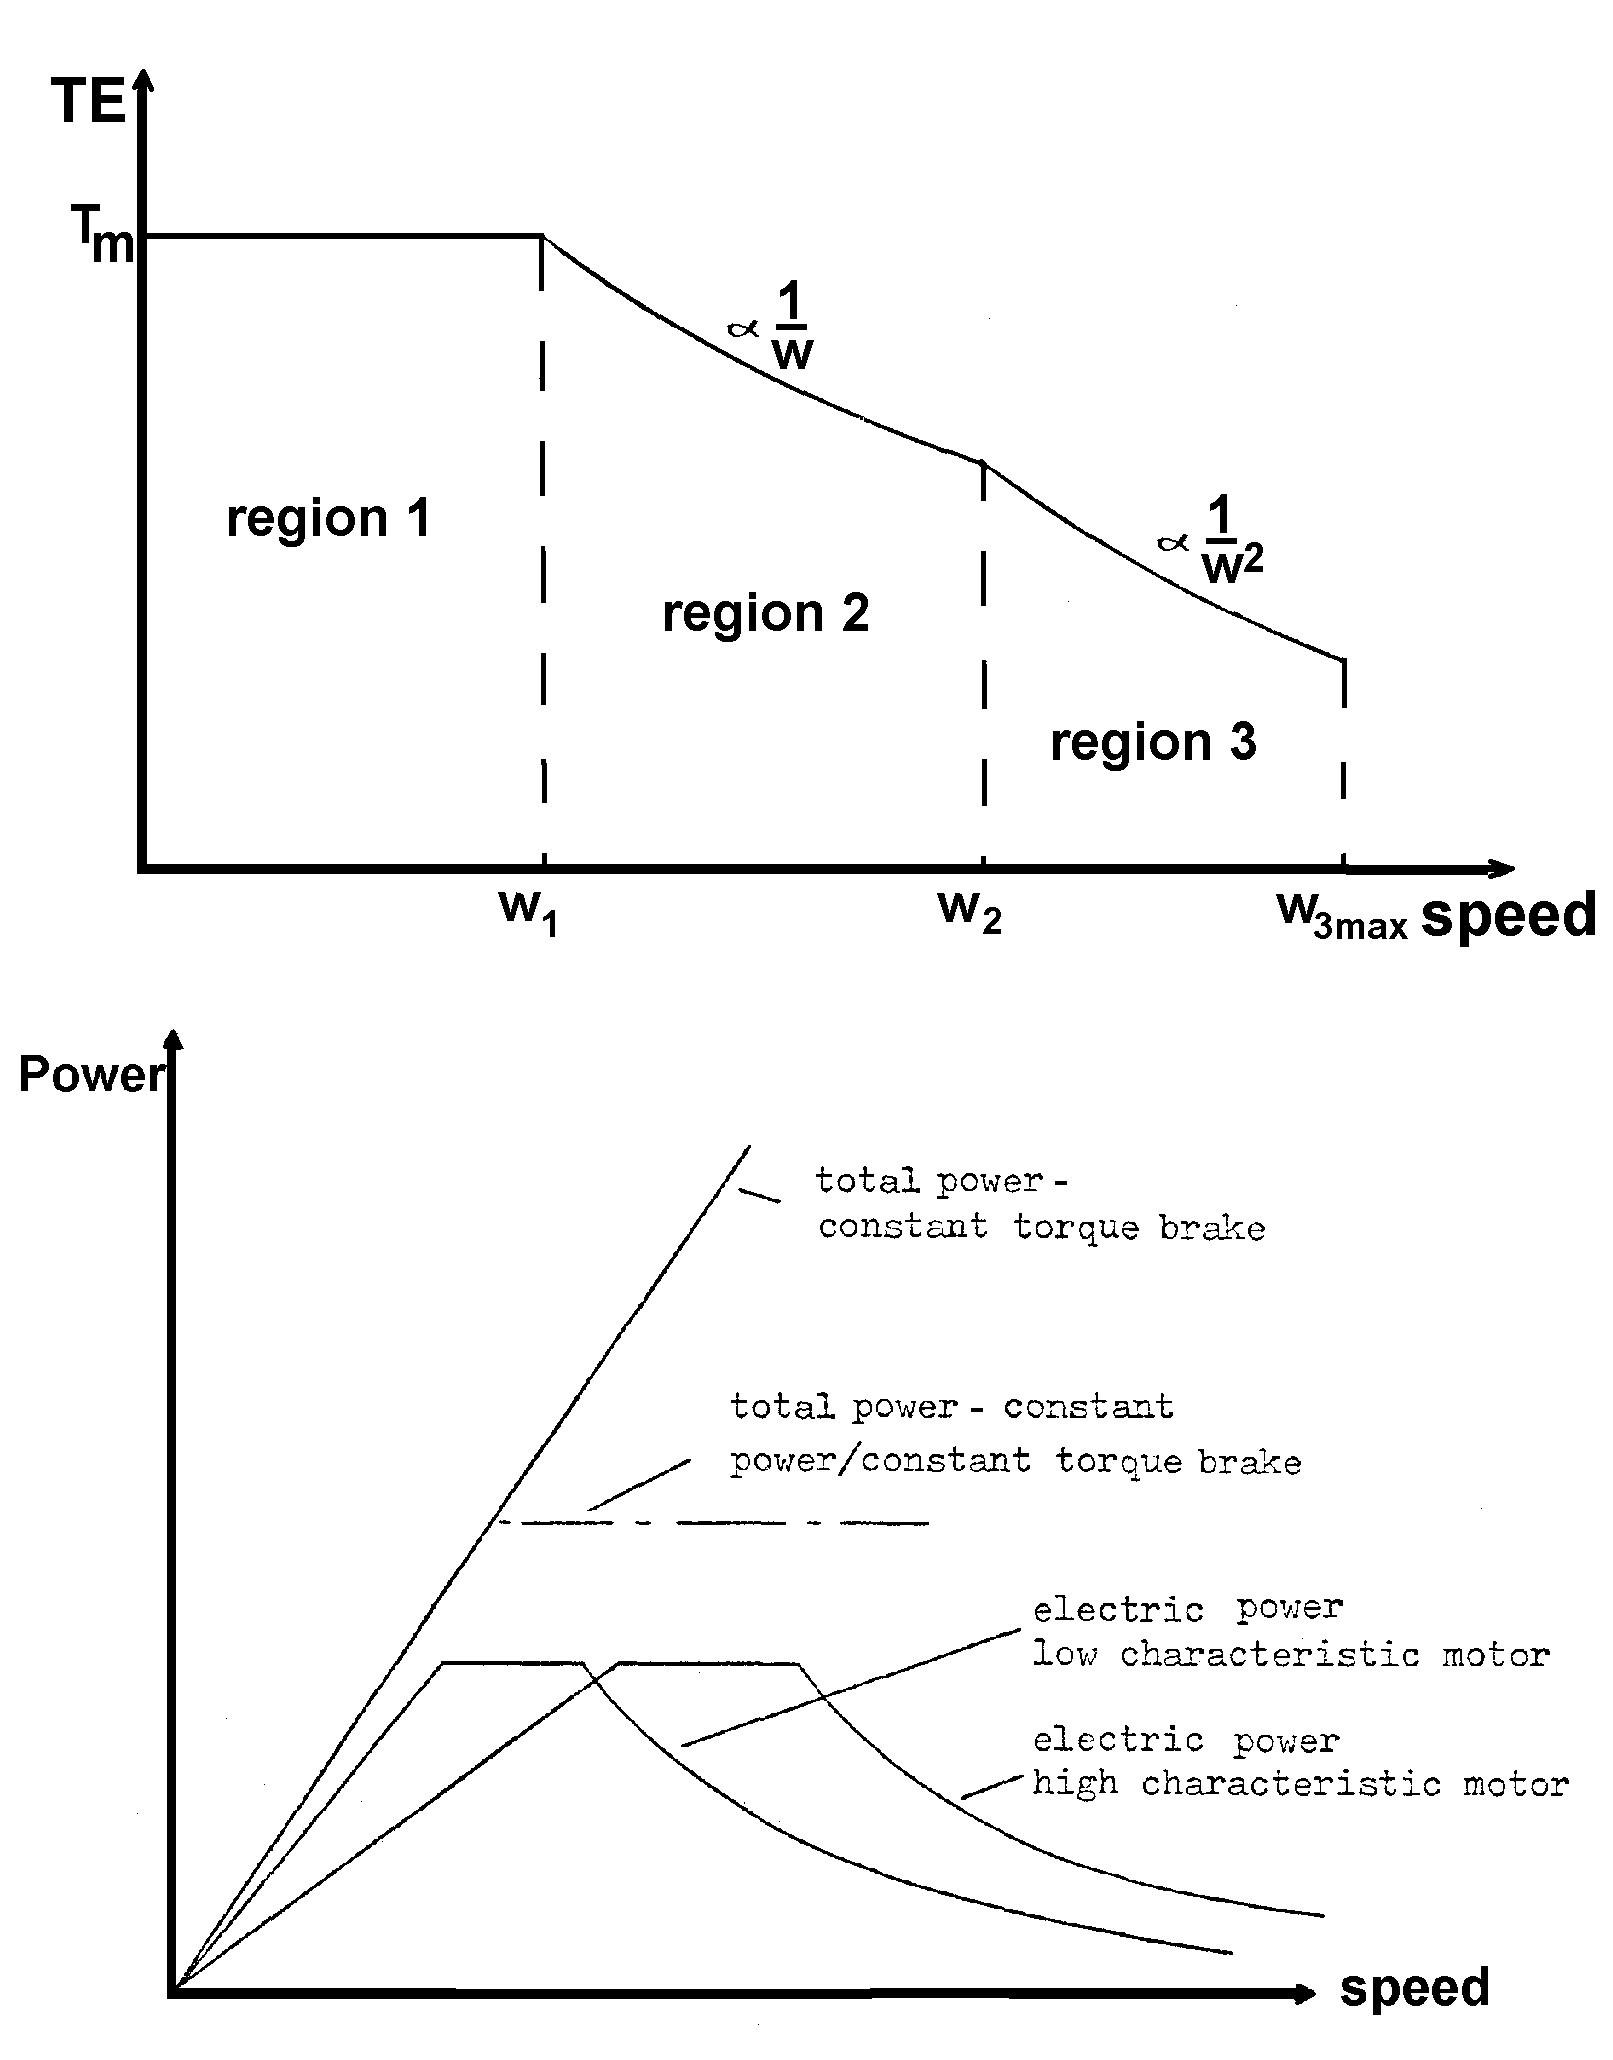 Line Diagram Of Regenerative Braking System Regenerative Braking Diagram Of Line Diagram Of Regenerative Braking System Regenerative Braking Diagram